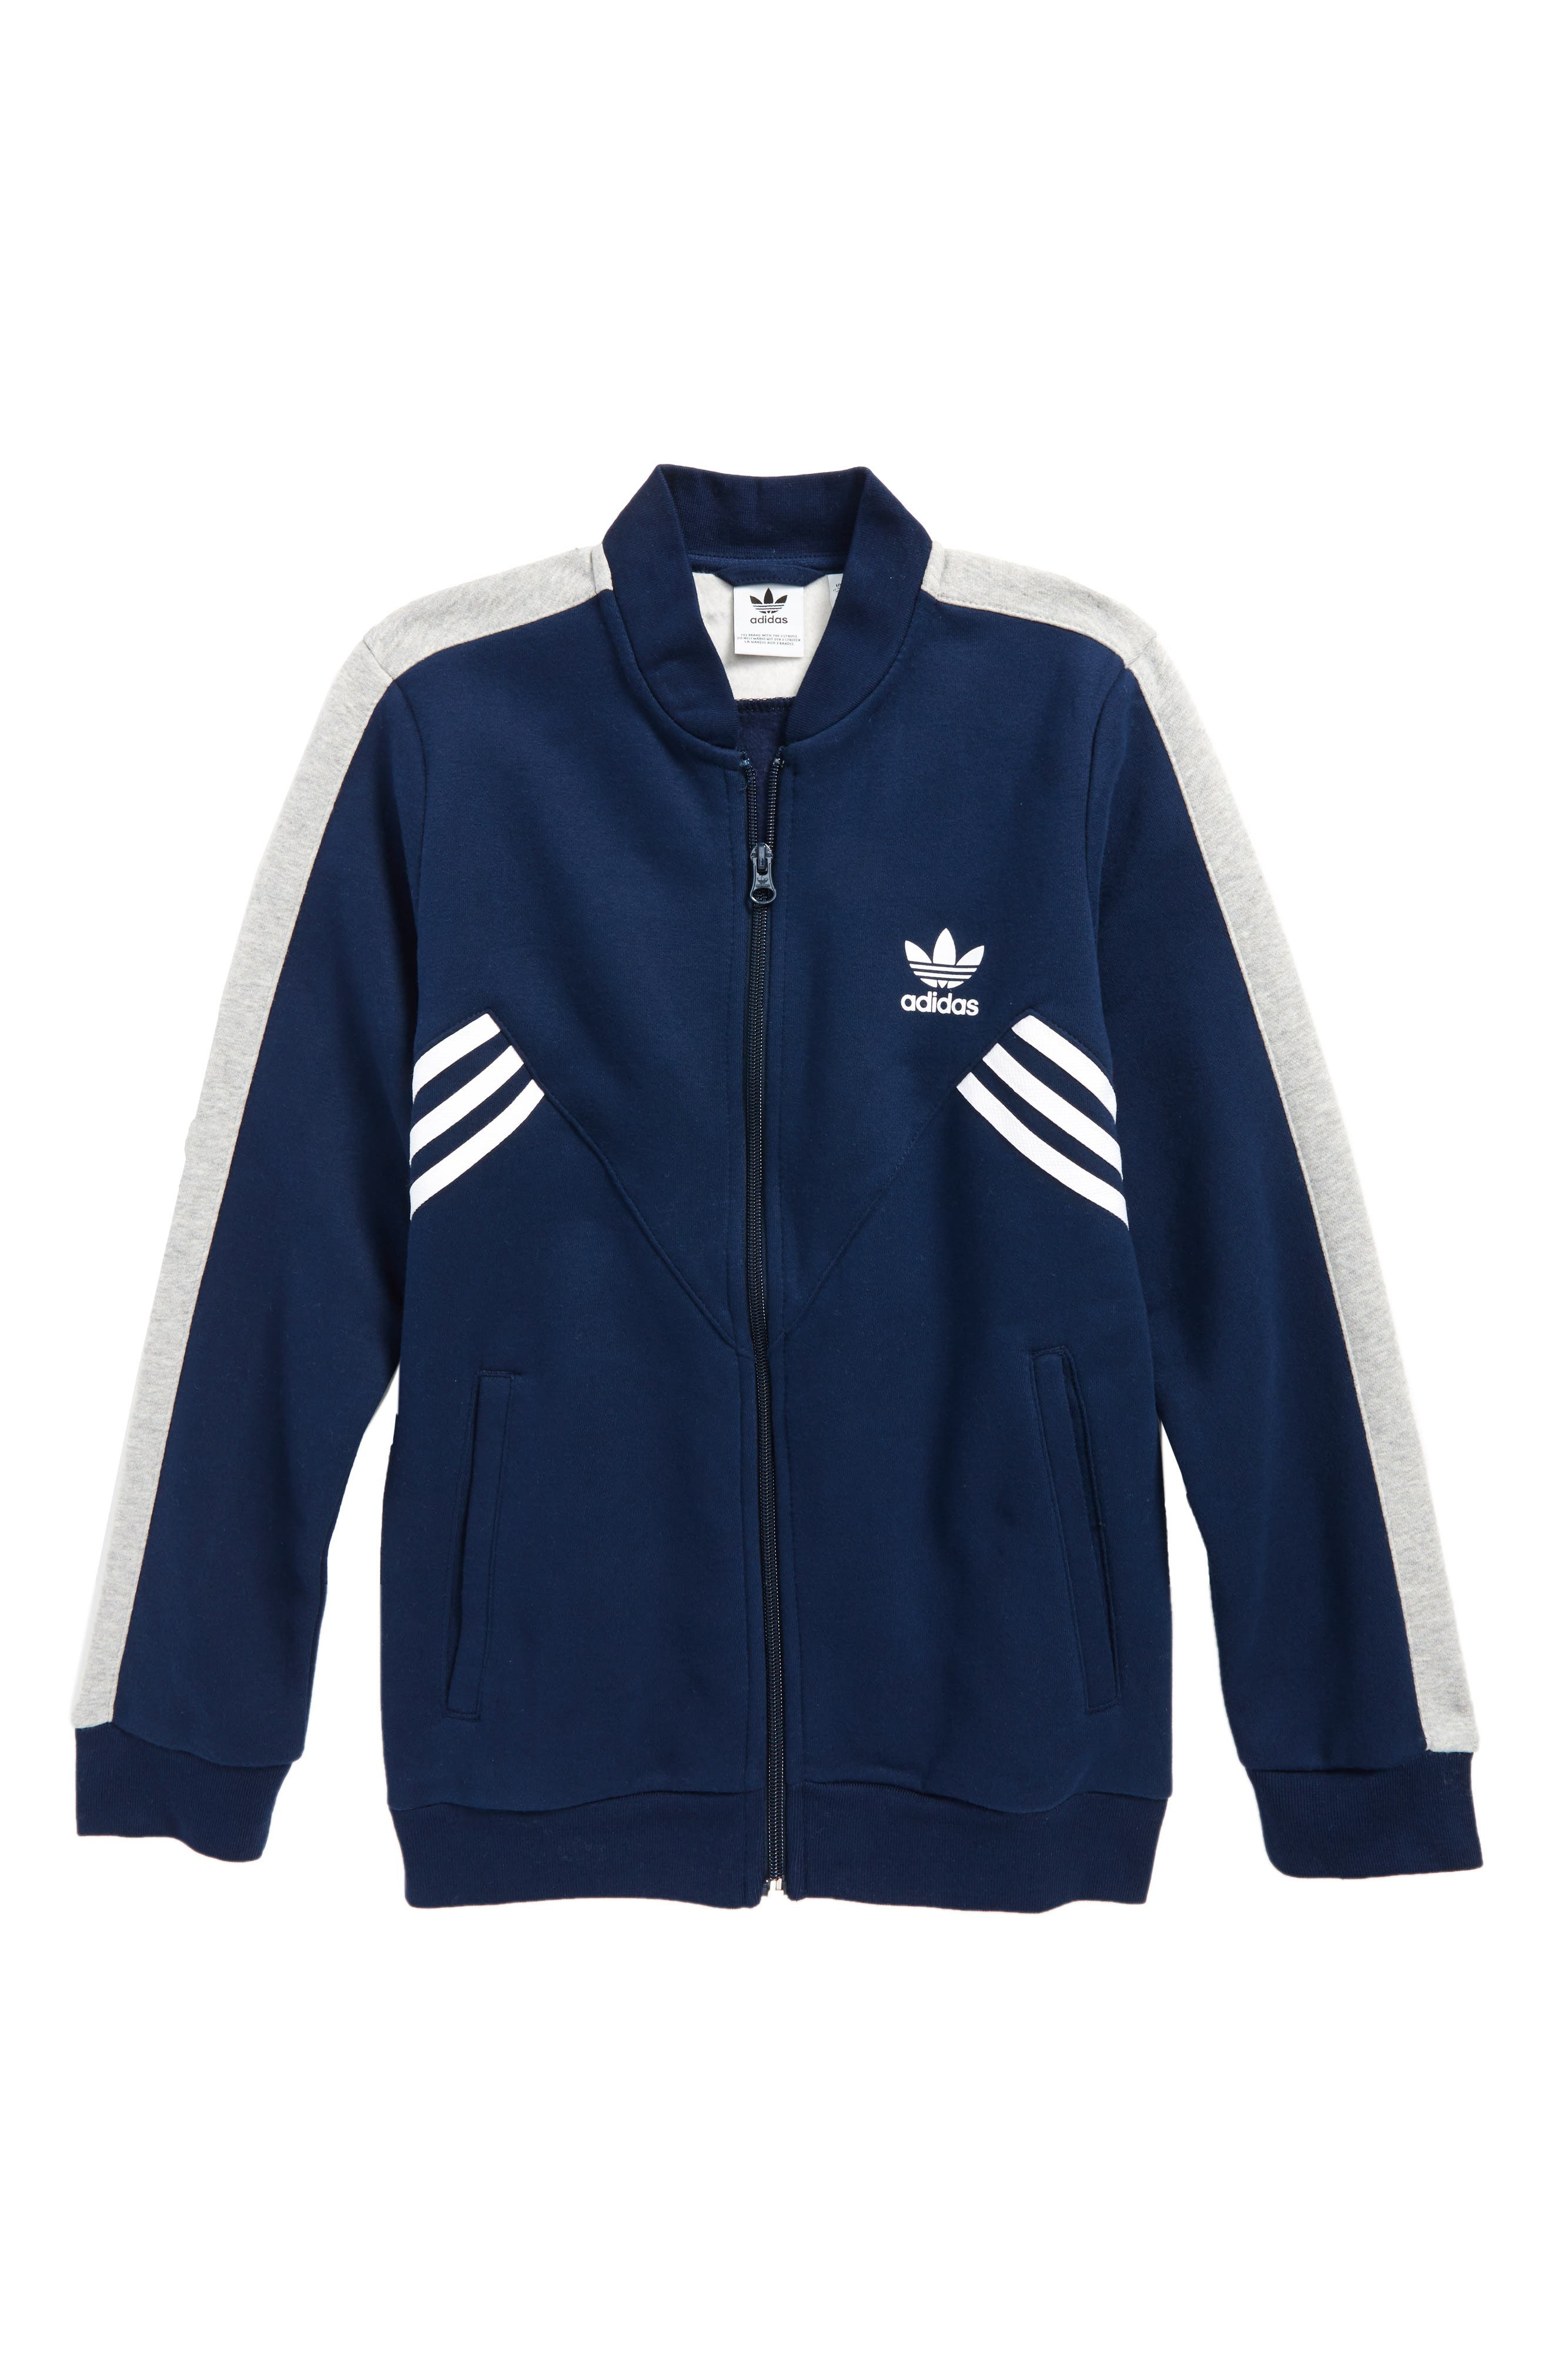 adidas SST Track Jacket,                         Main,                         color, Collegiate Navy/ Medium Grey